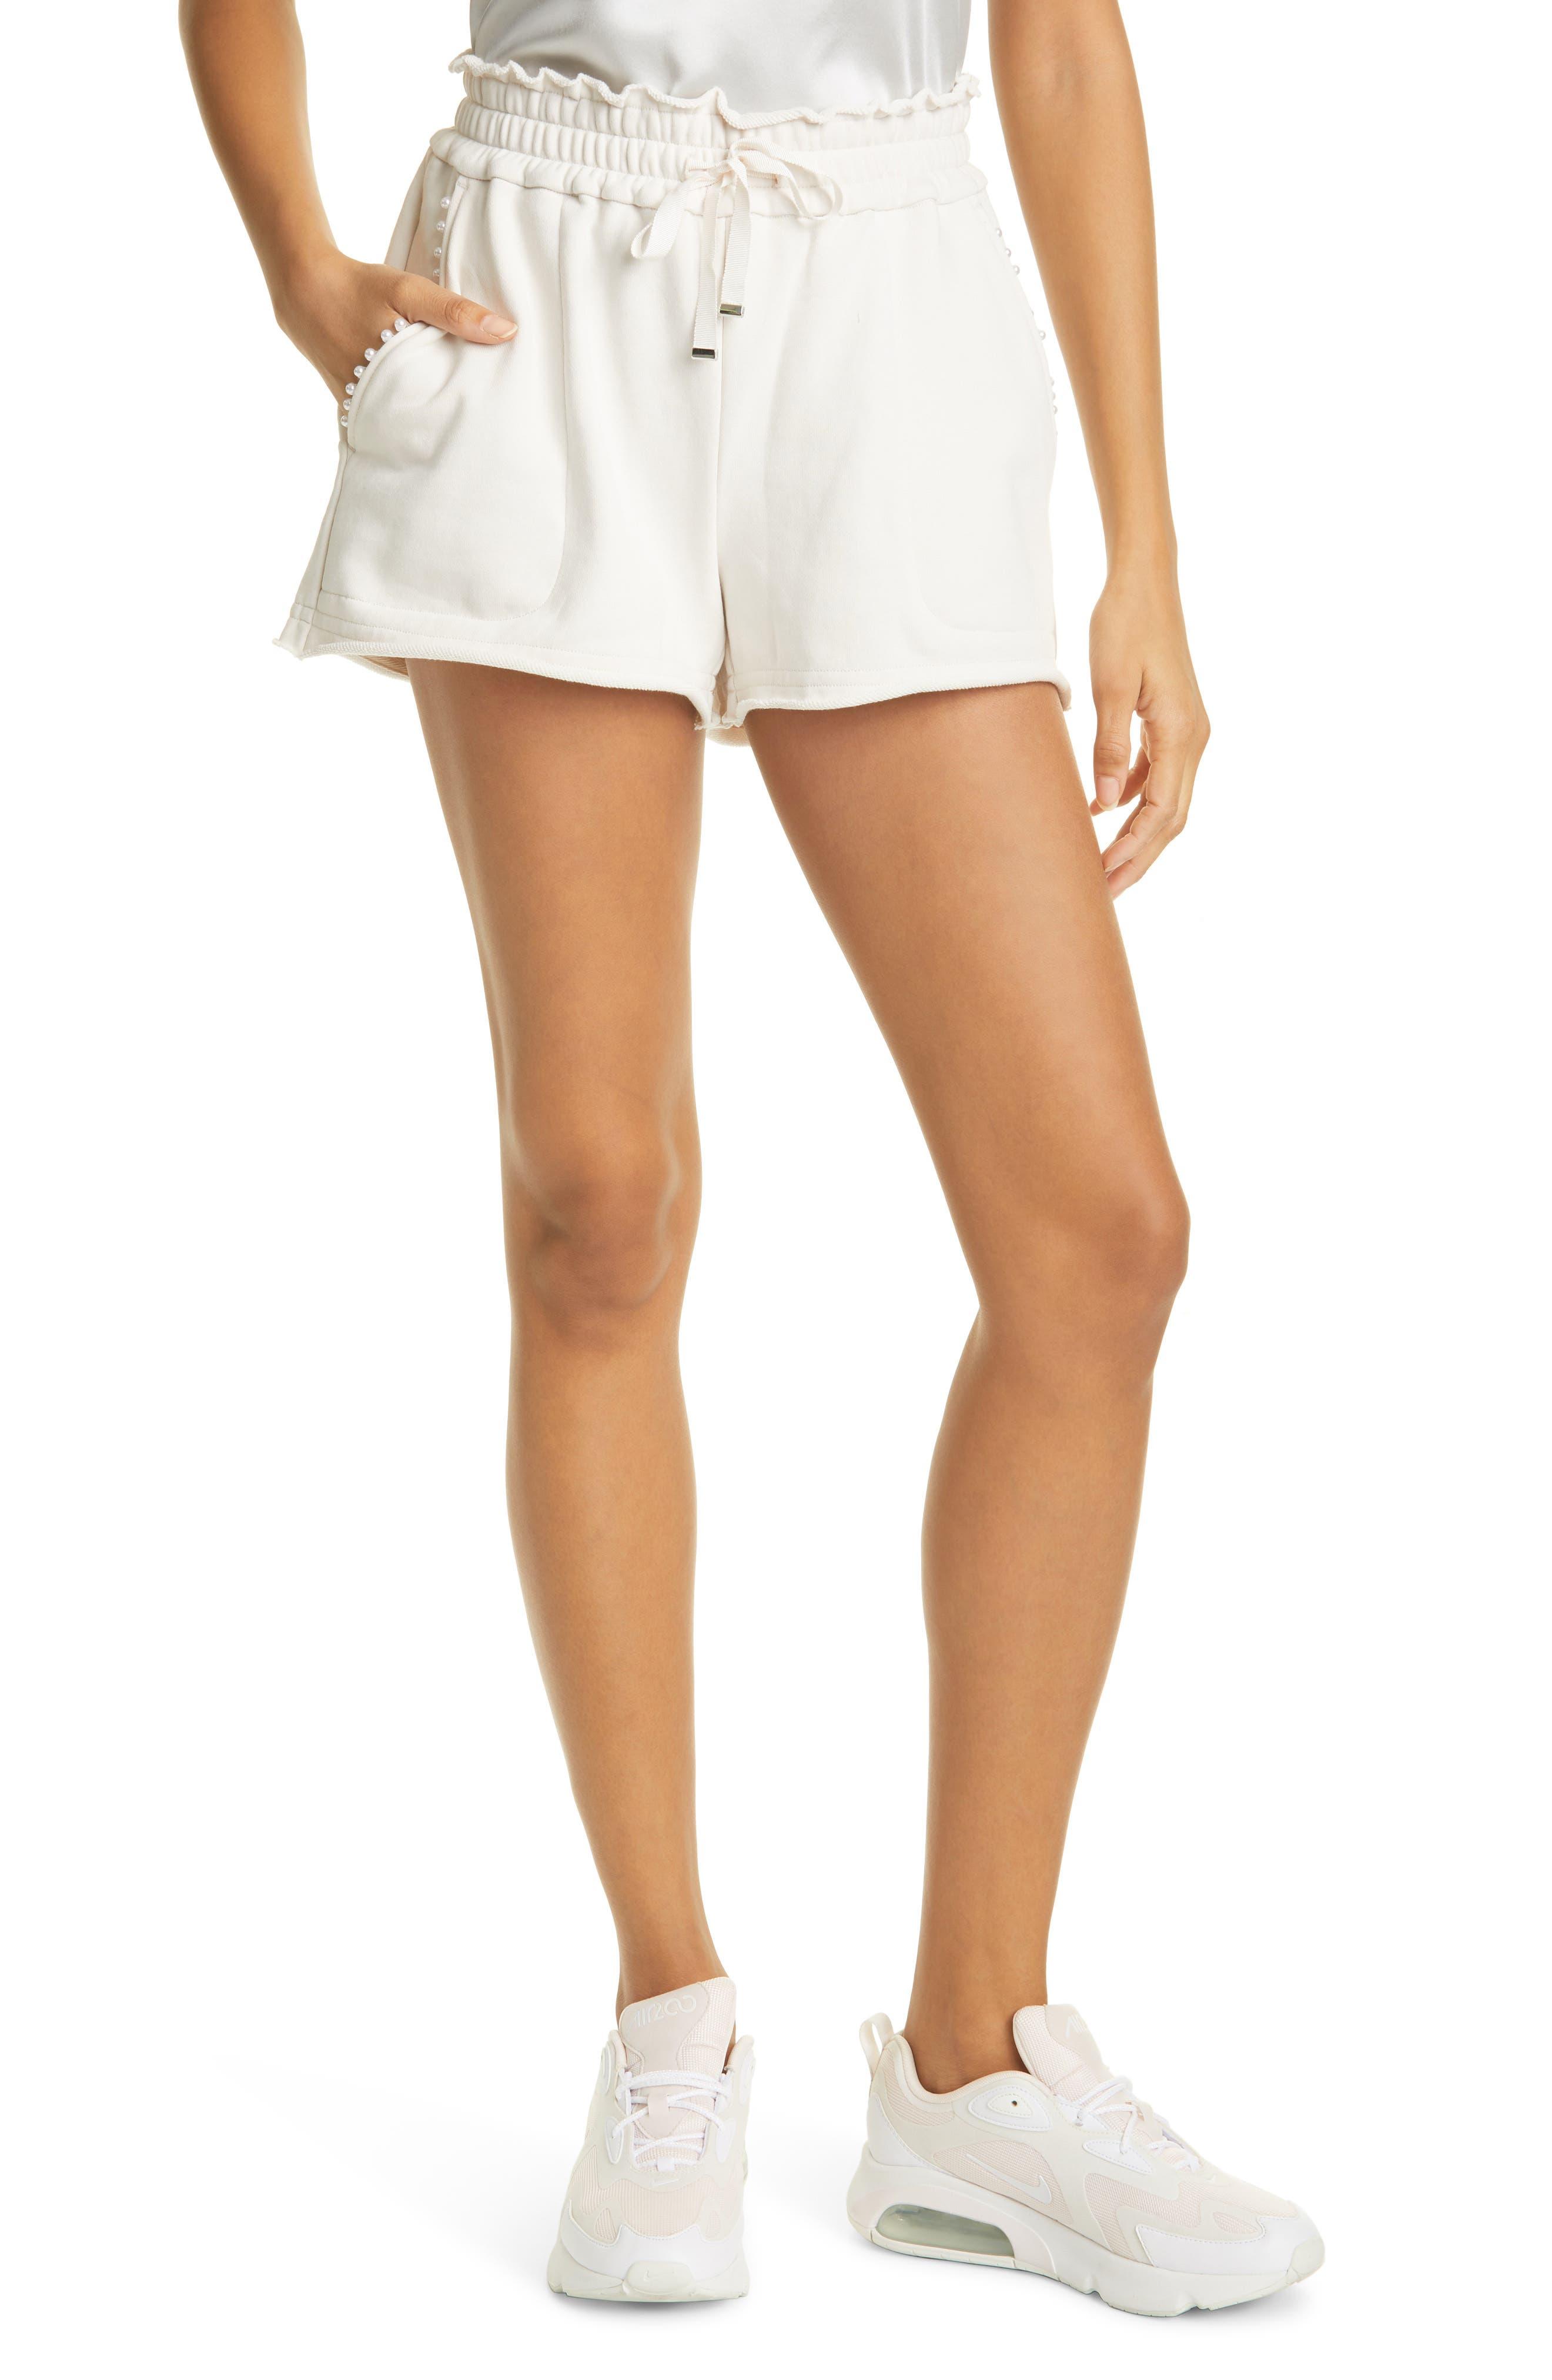 Lynley Pearl Sweat Shorts